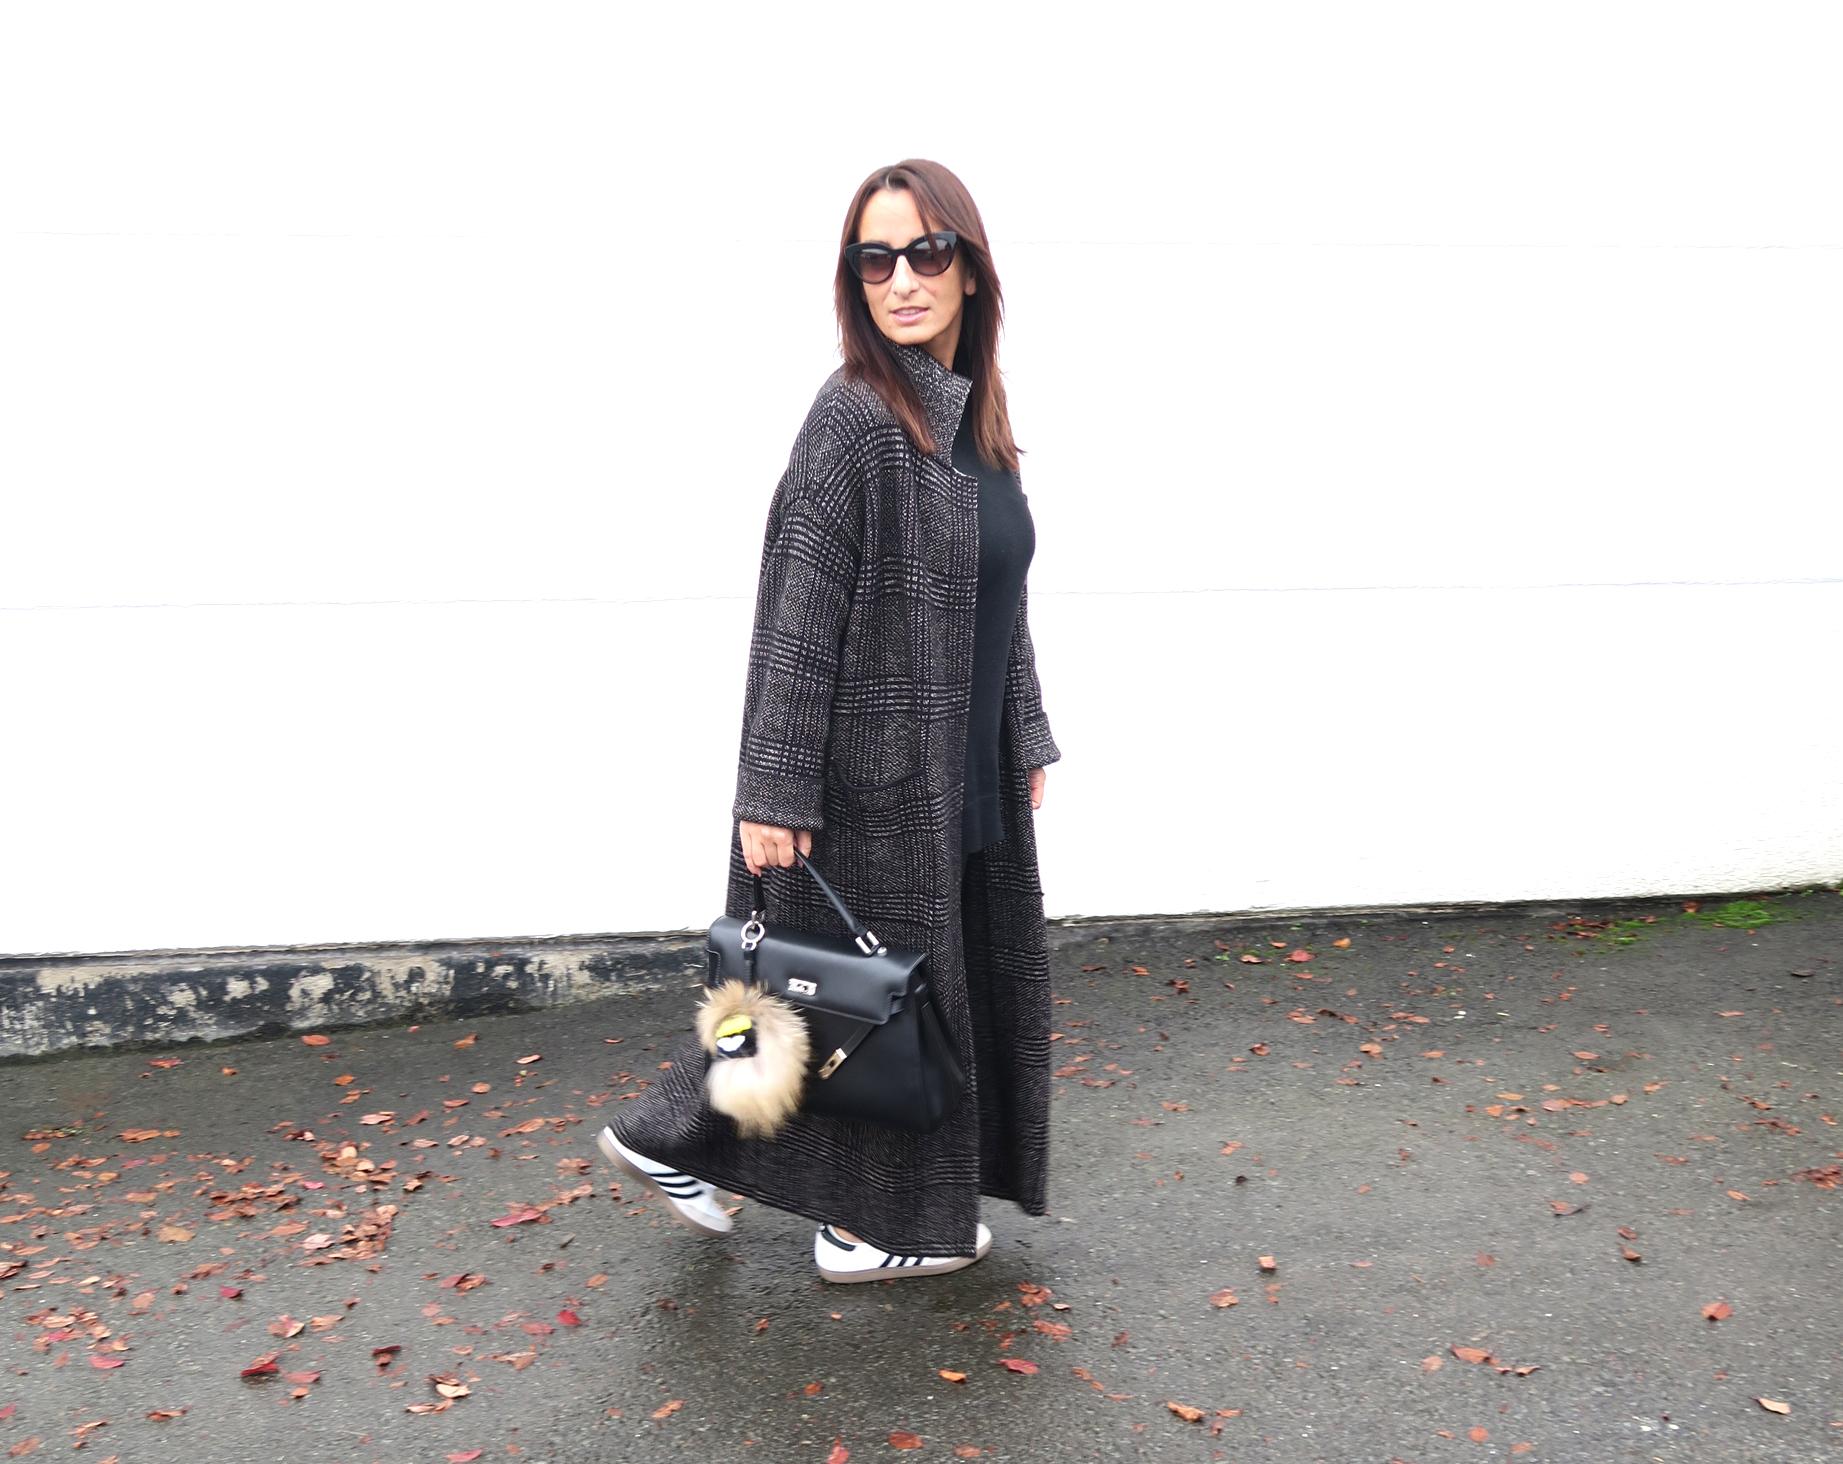 streetstyle-tartan-coat-zara-style-blogger-fendi-bag-3